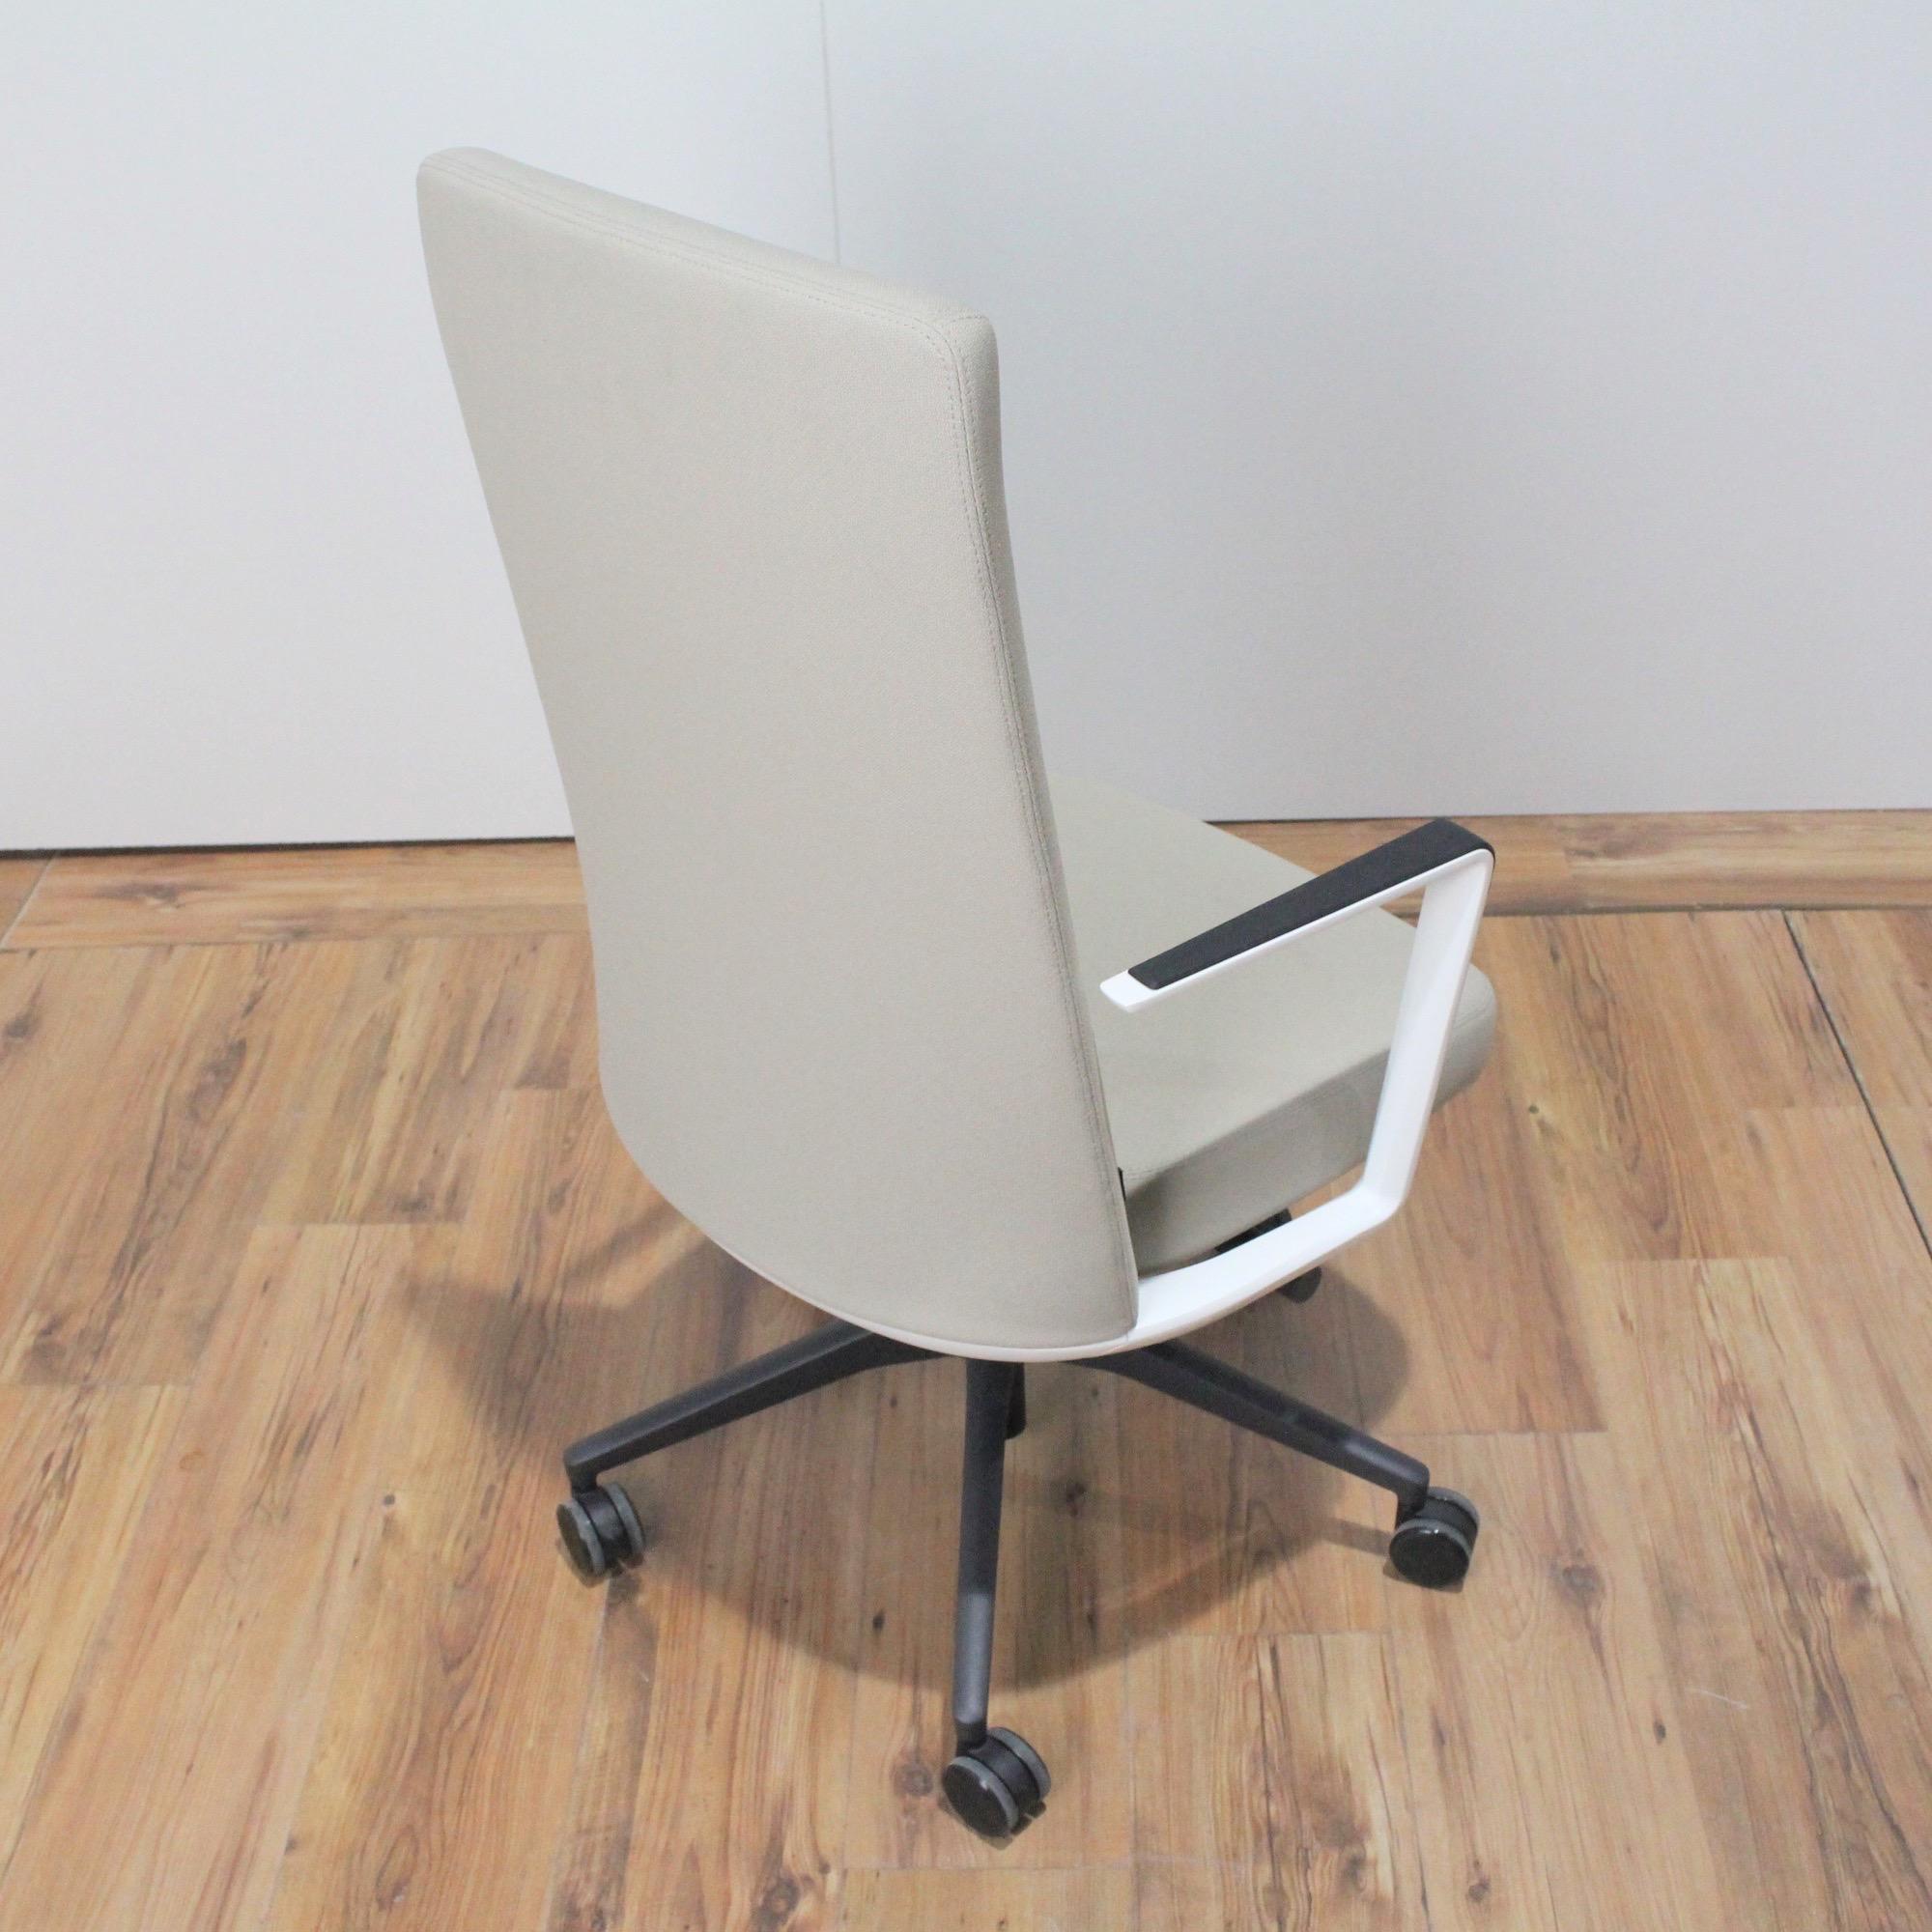 Drehstühle & -sessel Sitzmöbel Actiu Cron Bürodrehstuhl Stoff Beige Hohe Rückenlehne